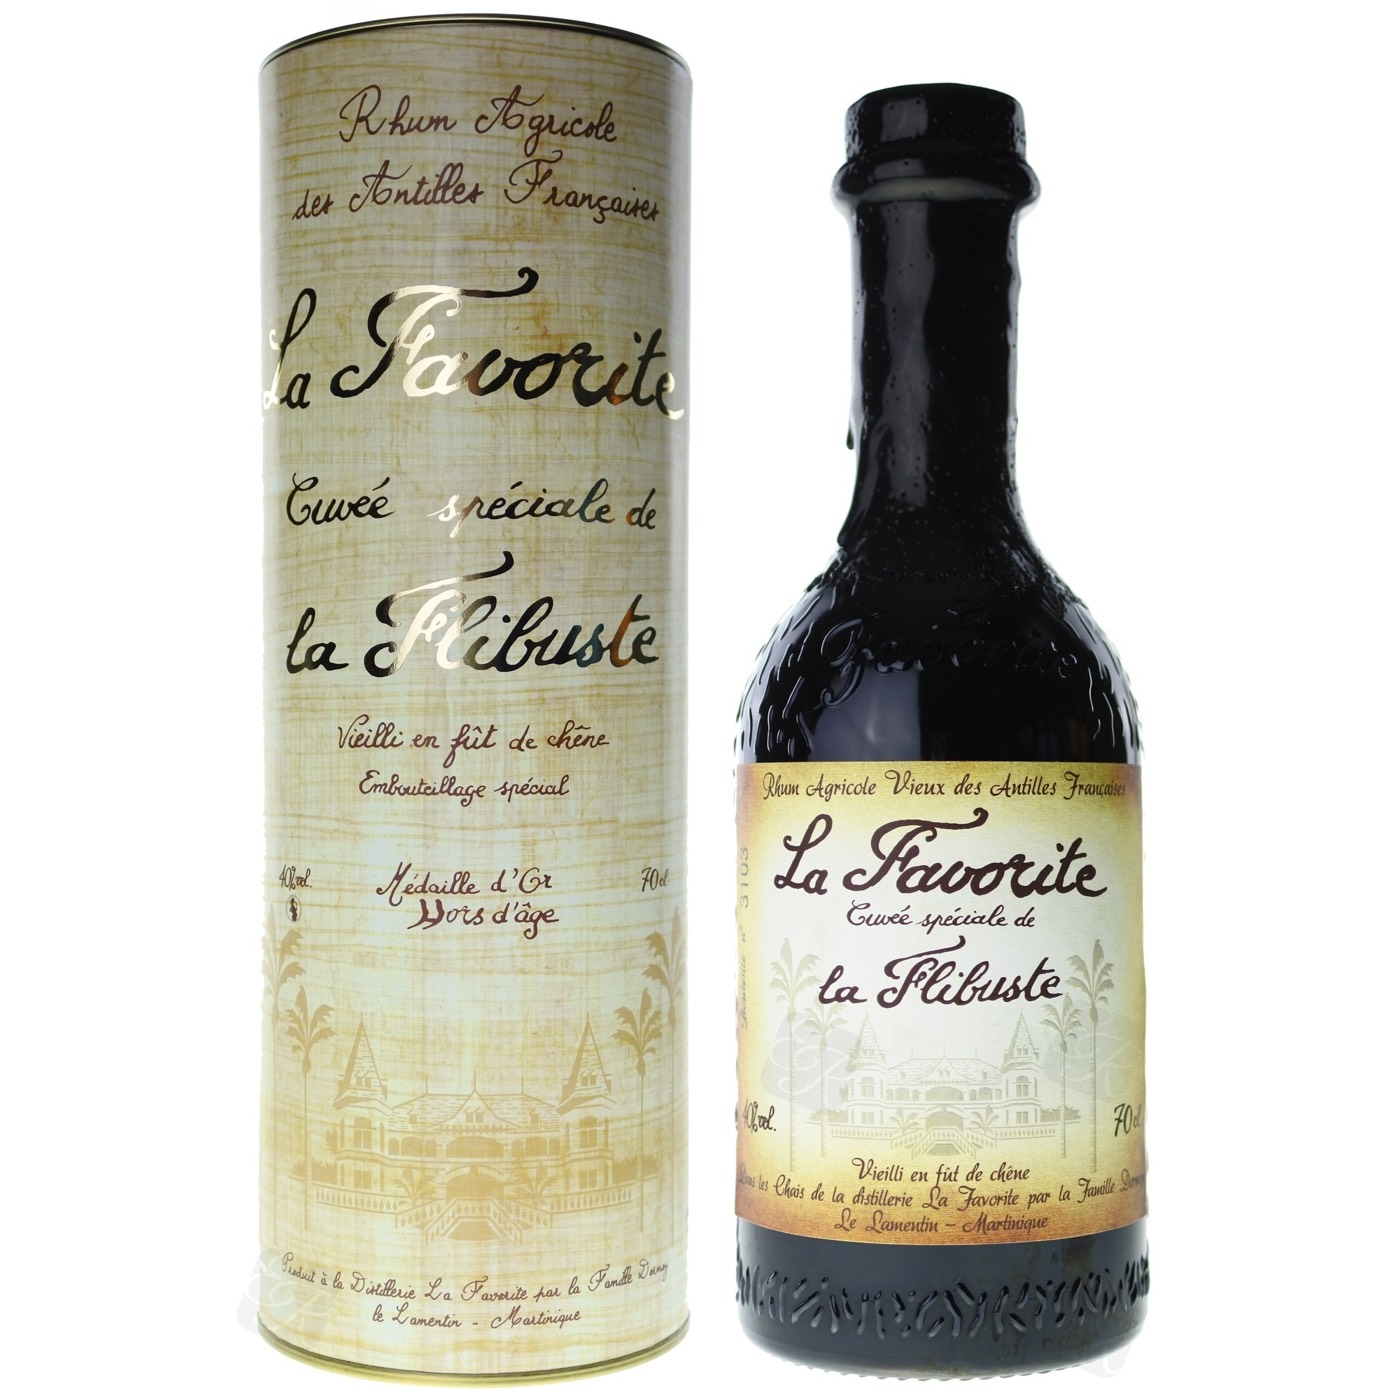 Bottle image of La Flibuste